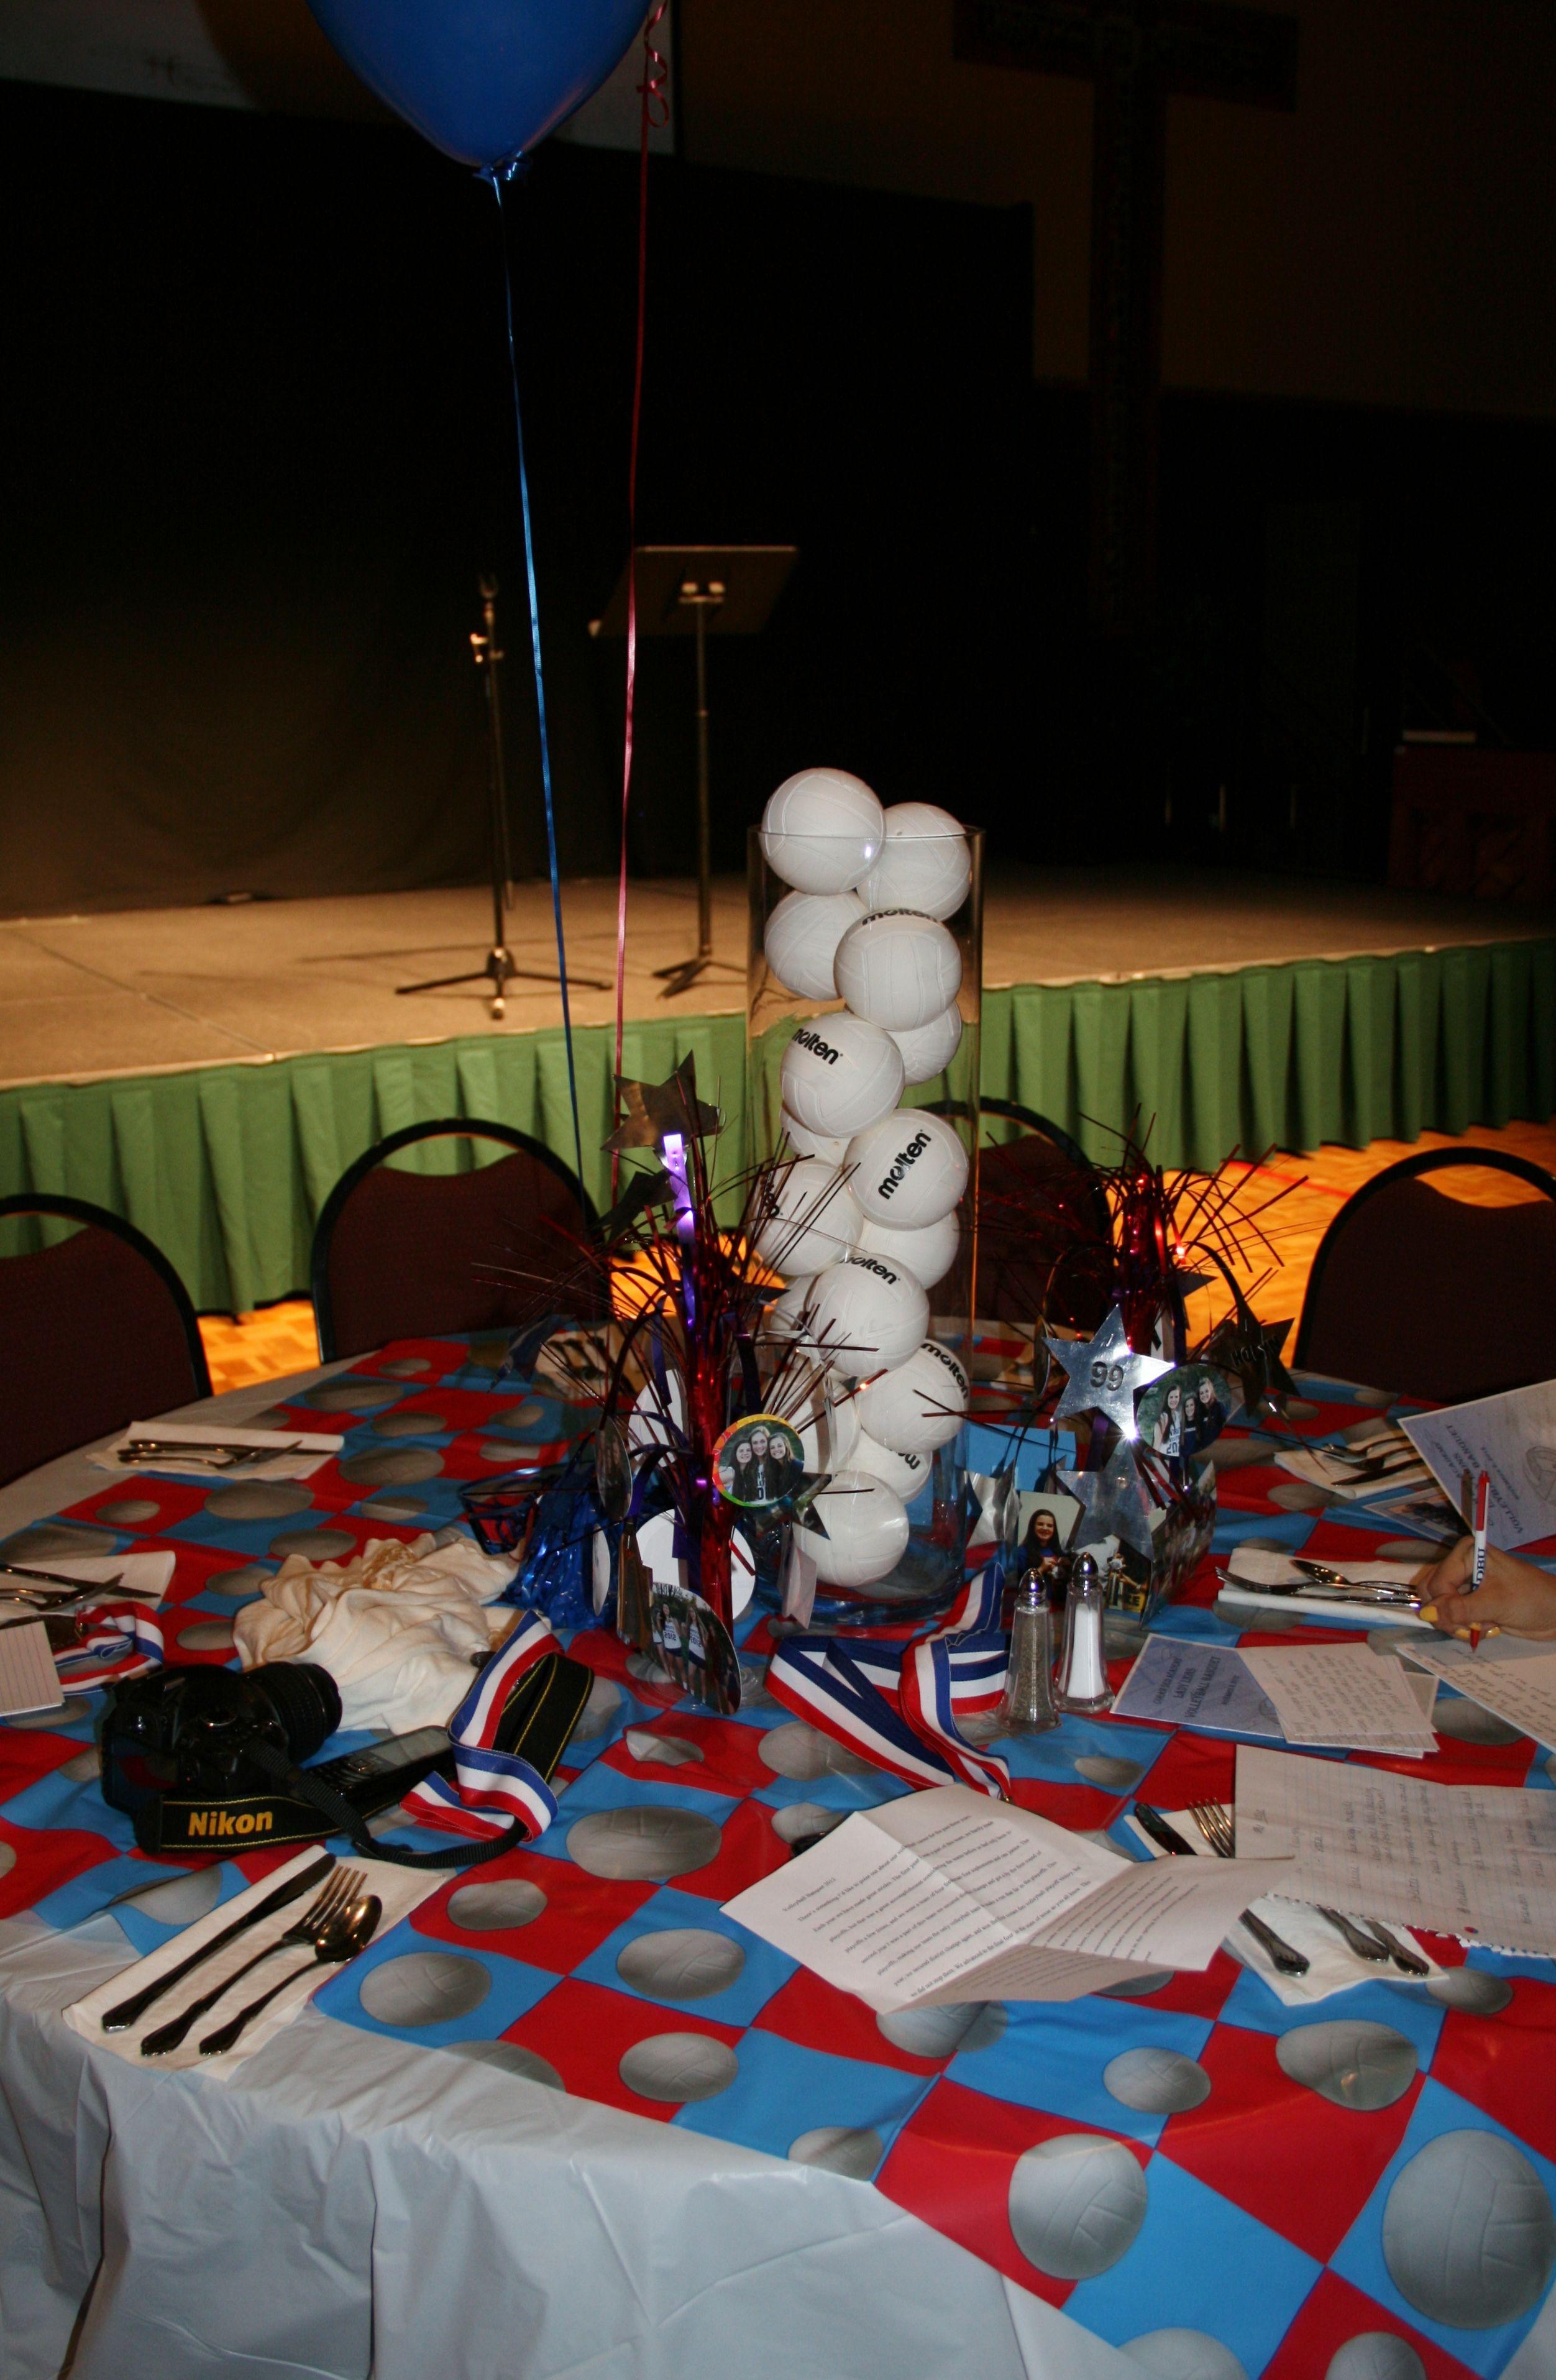 Volleyball Banquet 2012 Volleyball Crafts Sports Banquet Ideas Table Decorations Sports Decorations